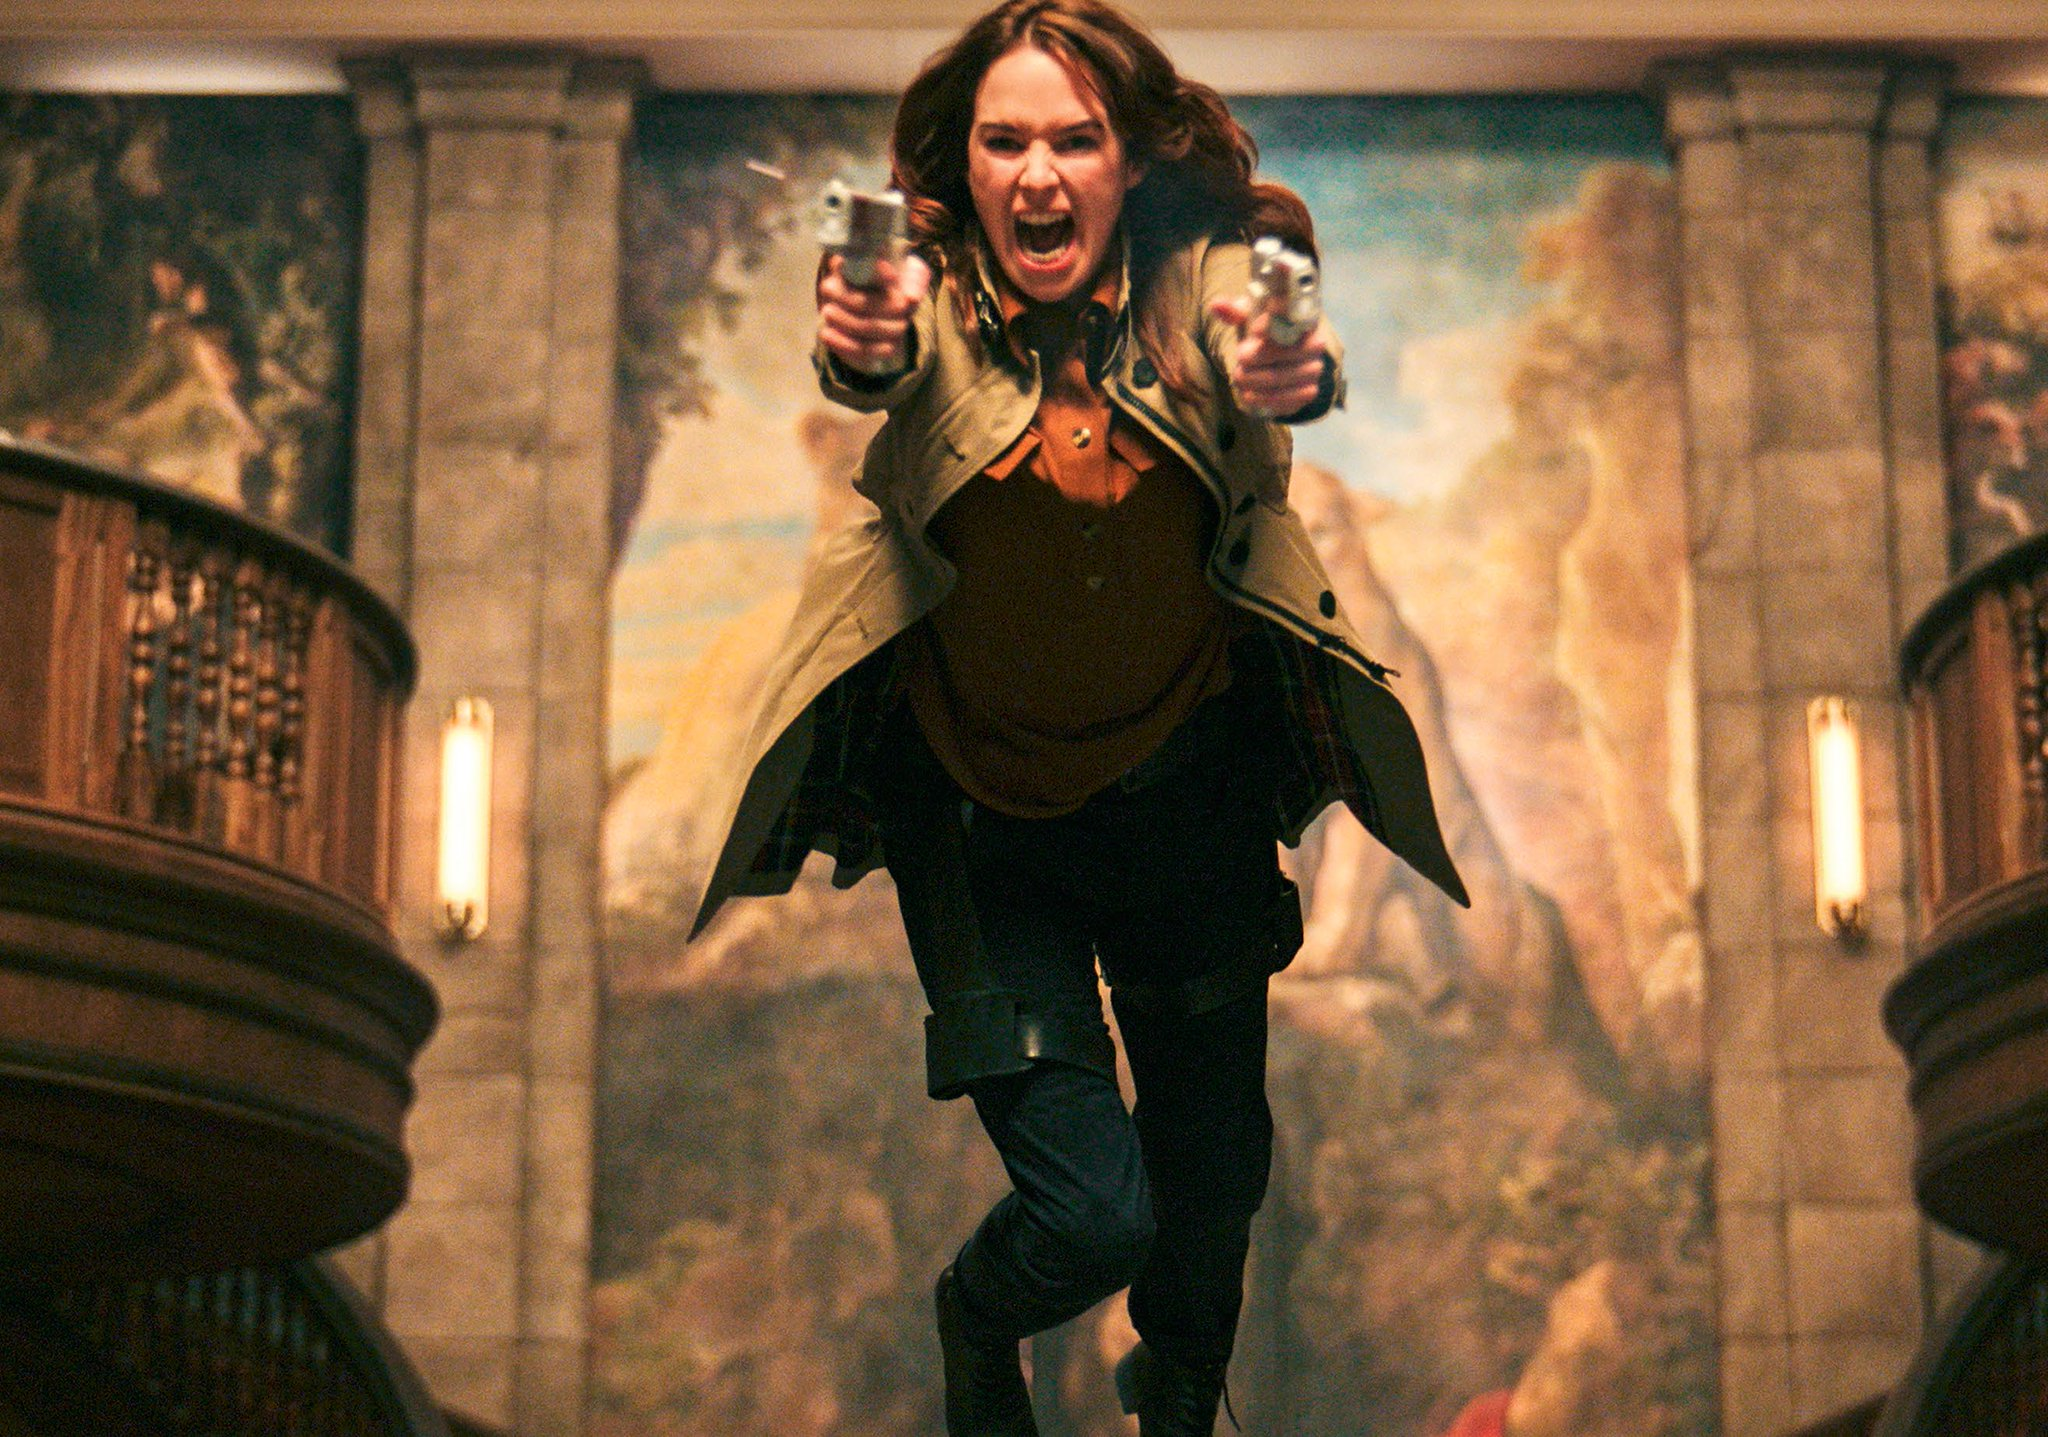 'Gunpowder Milkshake' llegará a Netflix USA en julio (póster oficial)